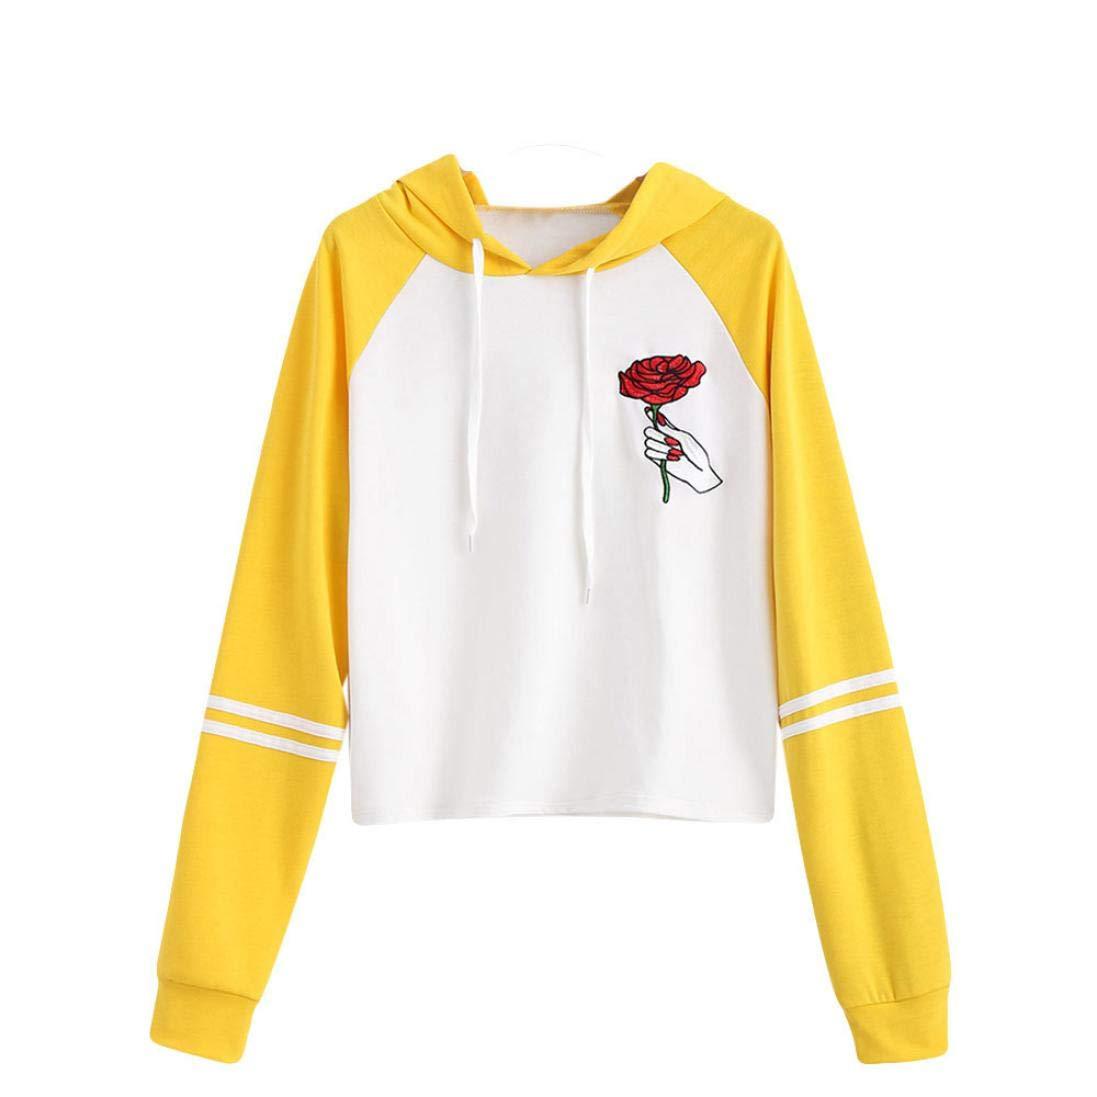 Anxinke Women Teen Girls Patchwork Embroidered Sweatshirts Long Sleeve Drawstring Hodies (S, Yellow)